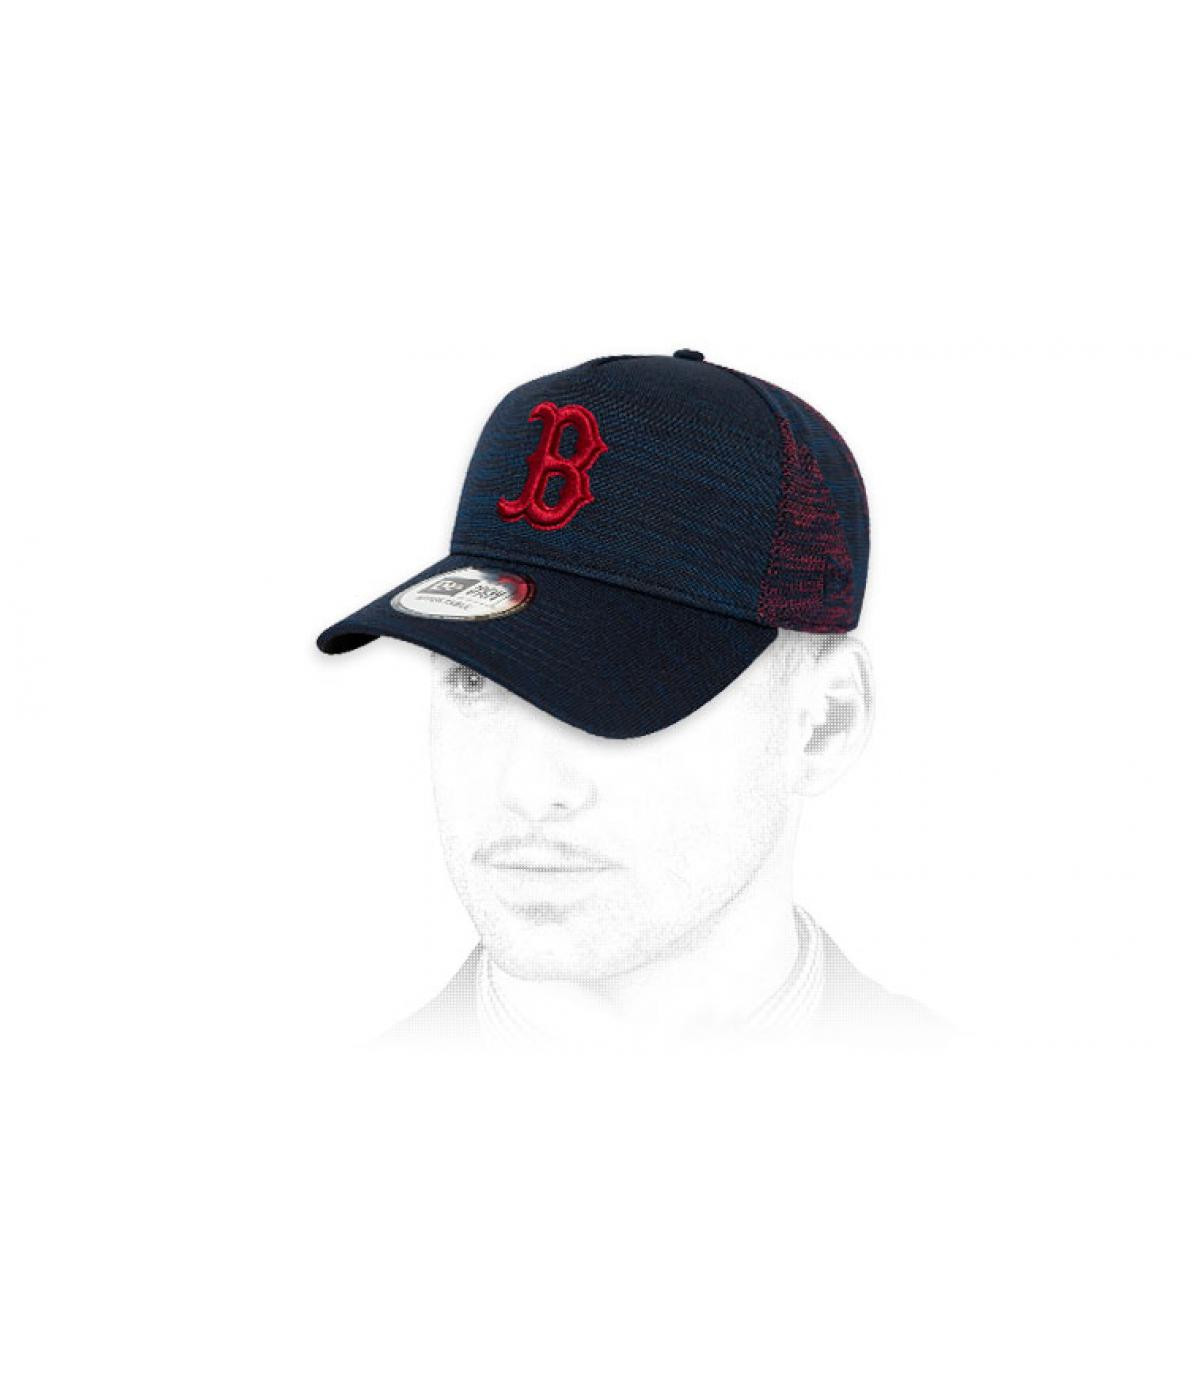 gorra B azul rojo